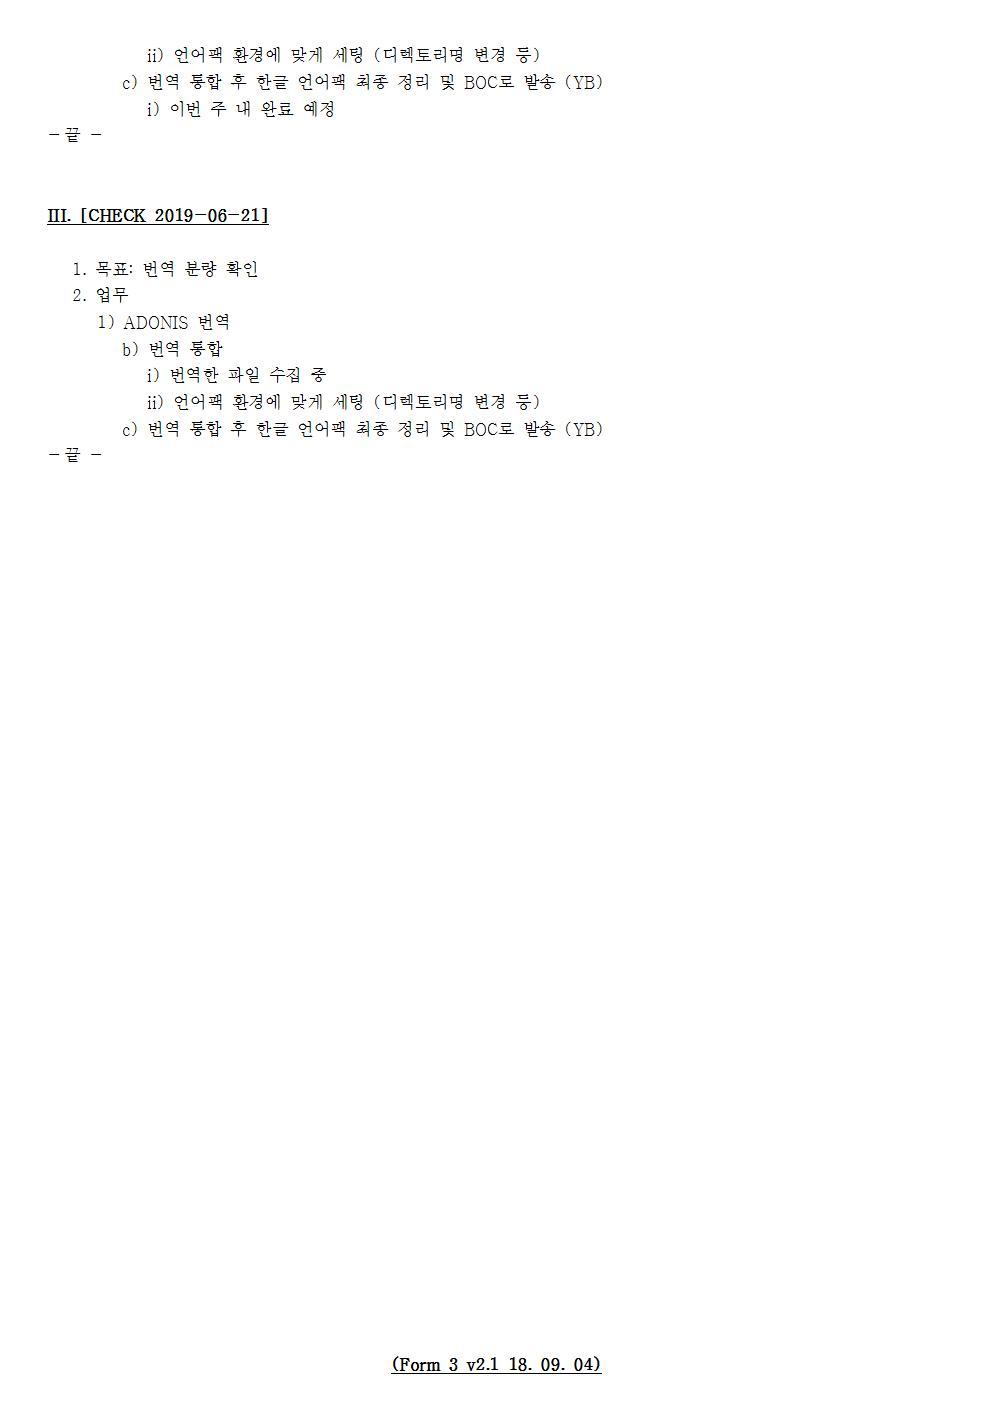 D-[19-033-BZ-05]-[ADONIS Translation]-[2019-06-21][YB]-[19-6-3]-[P+D+C]002.jpg